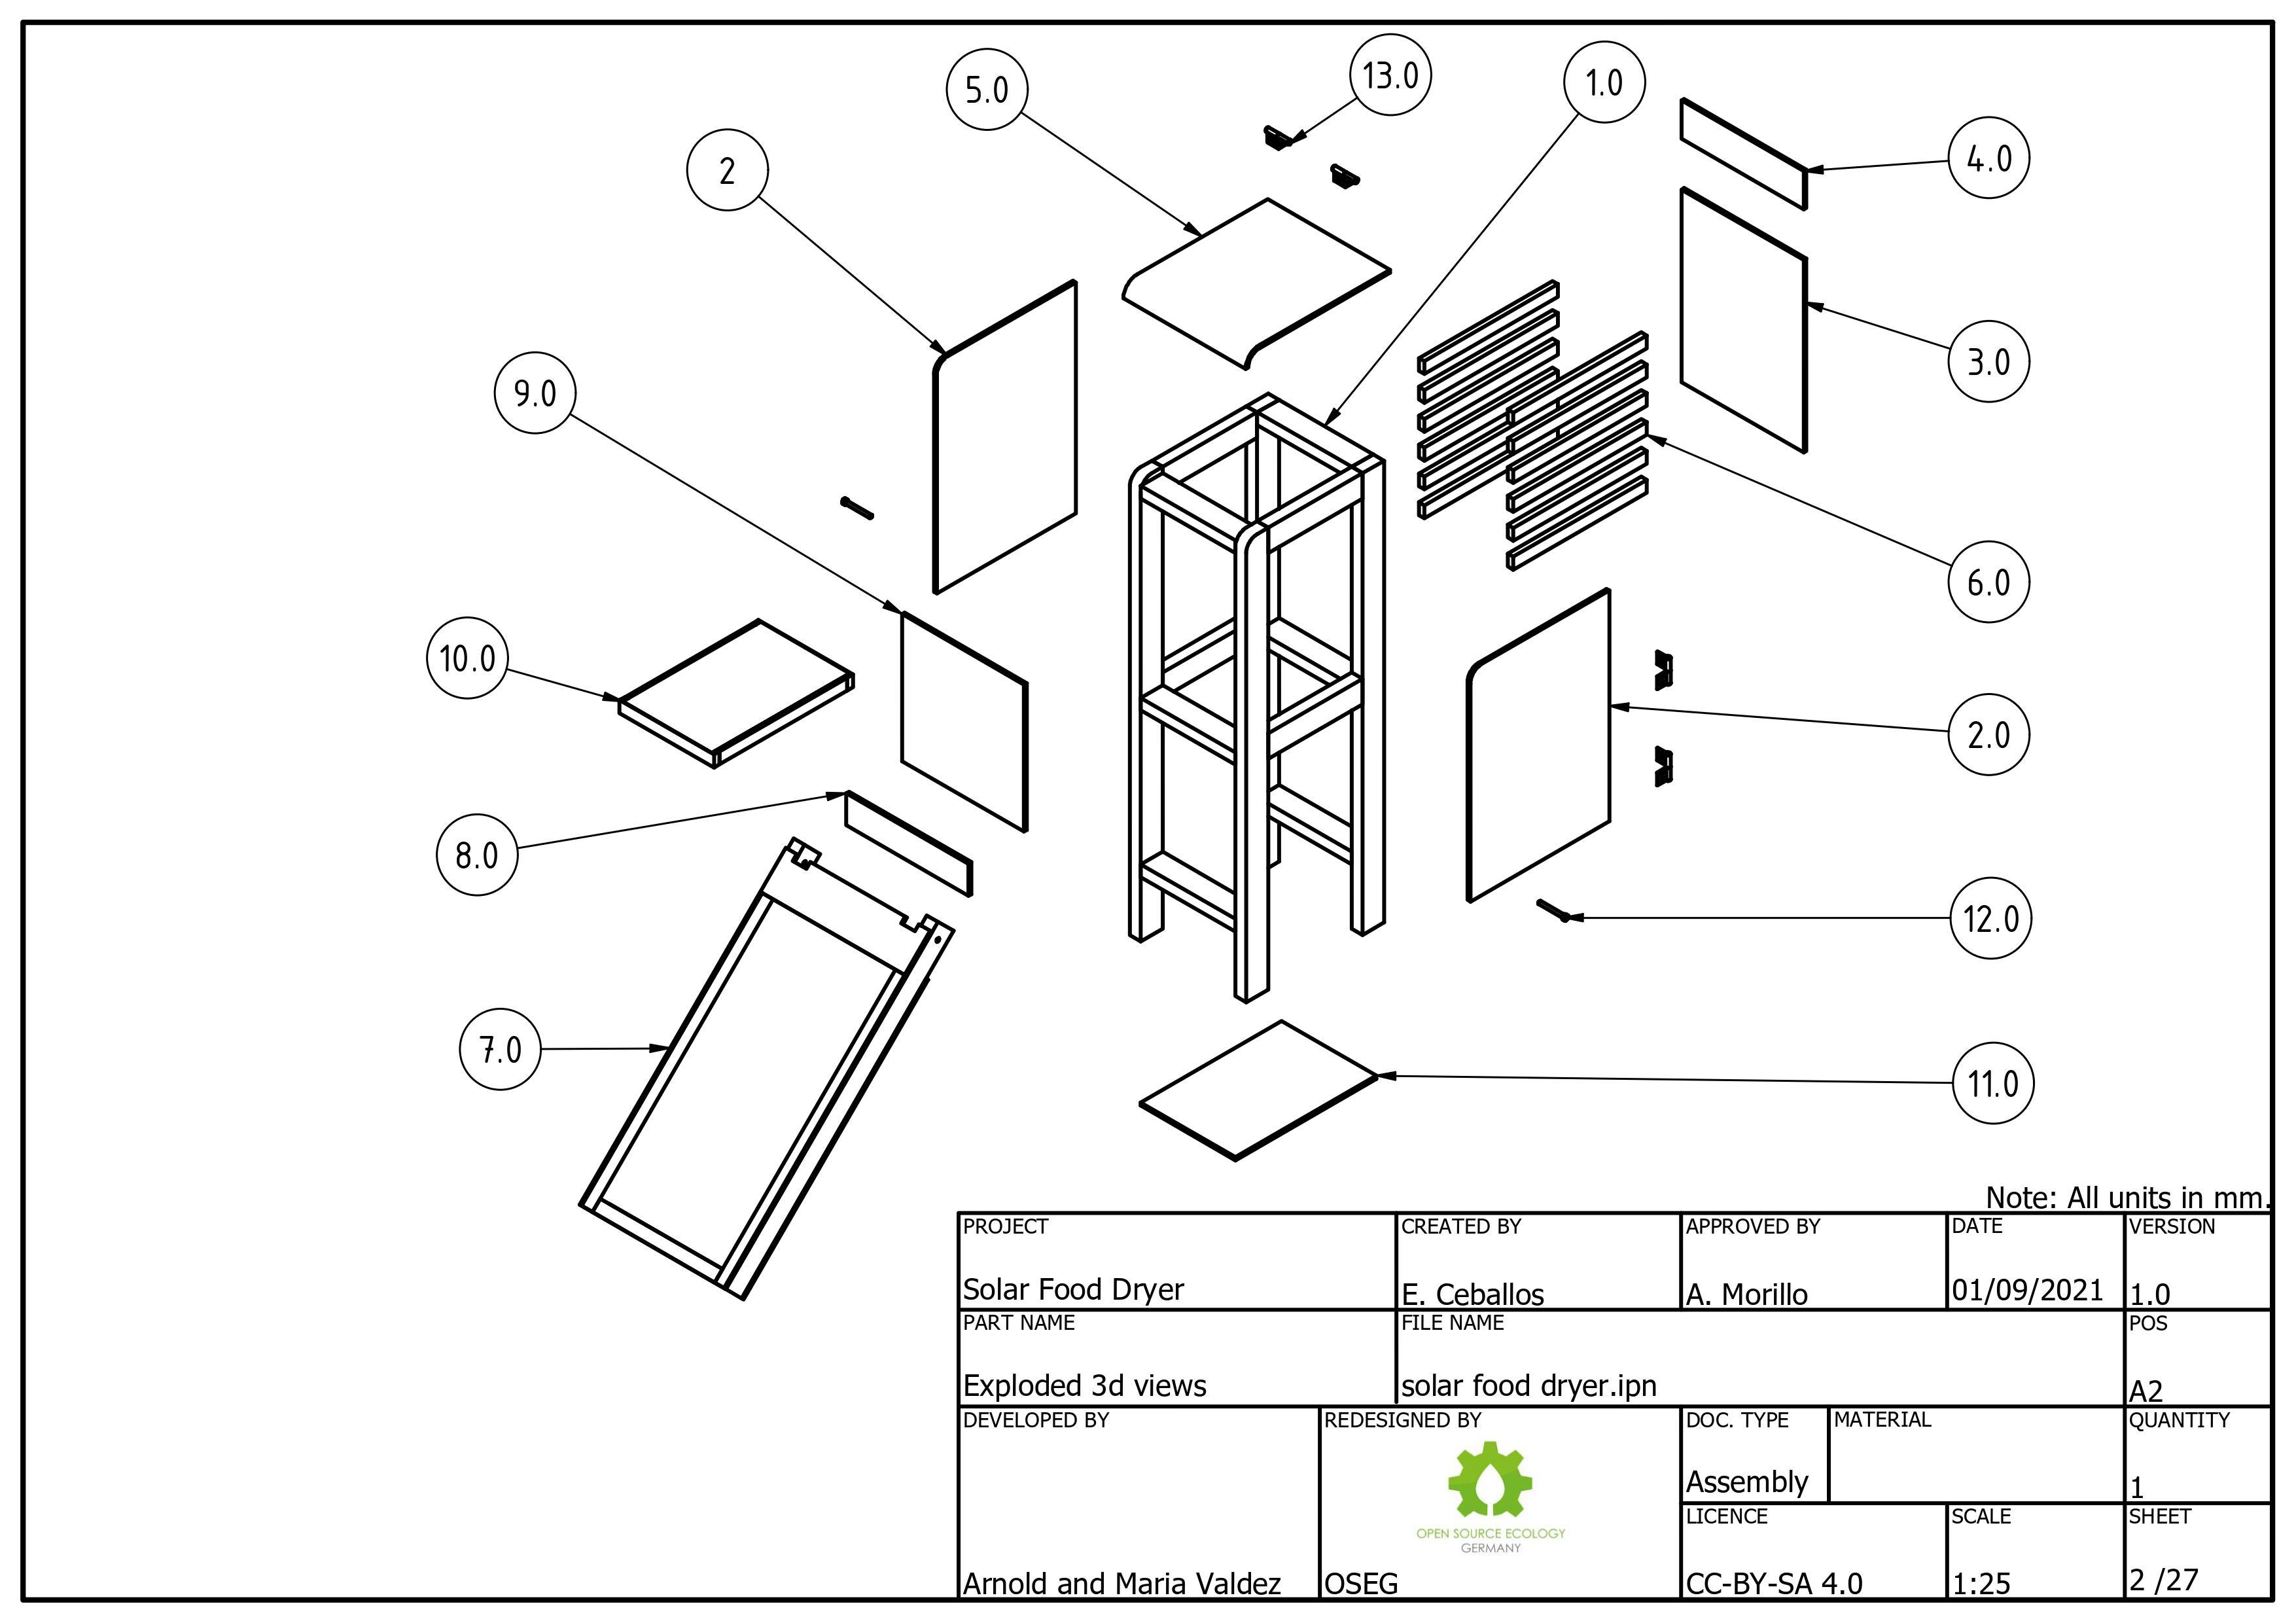 Amv bsfd building-solar-food-dryer 0002.jpg